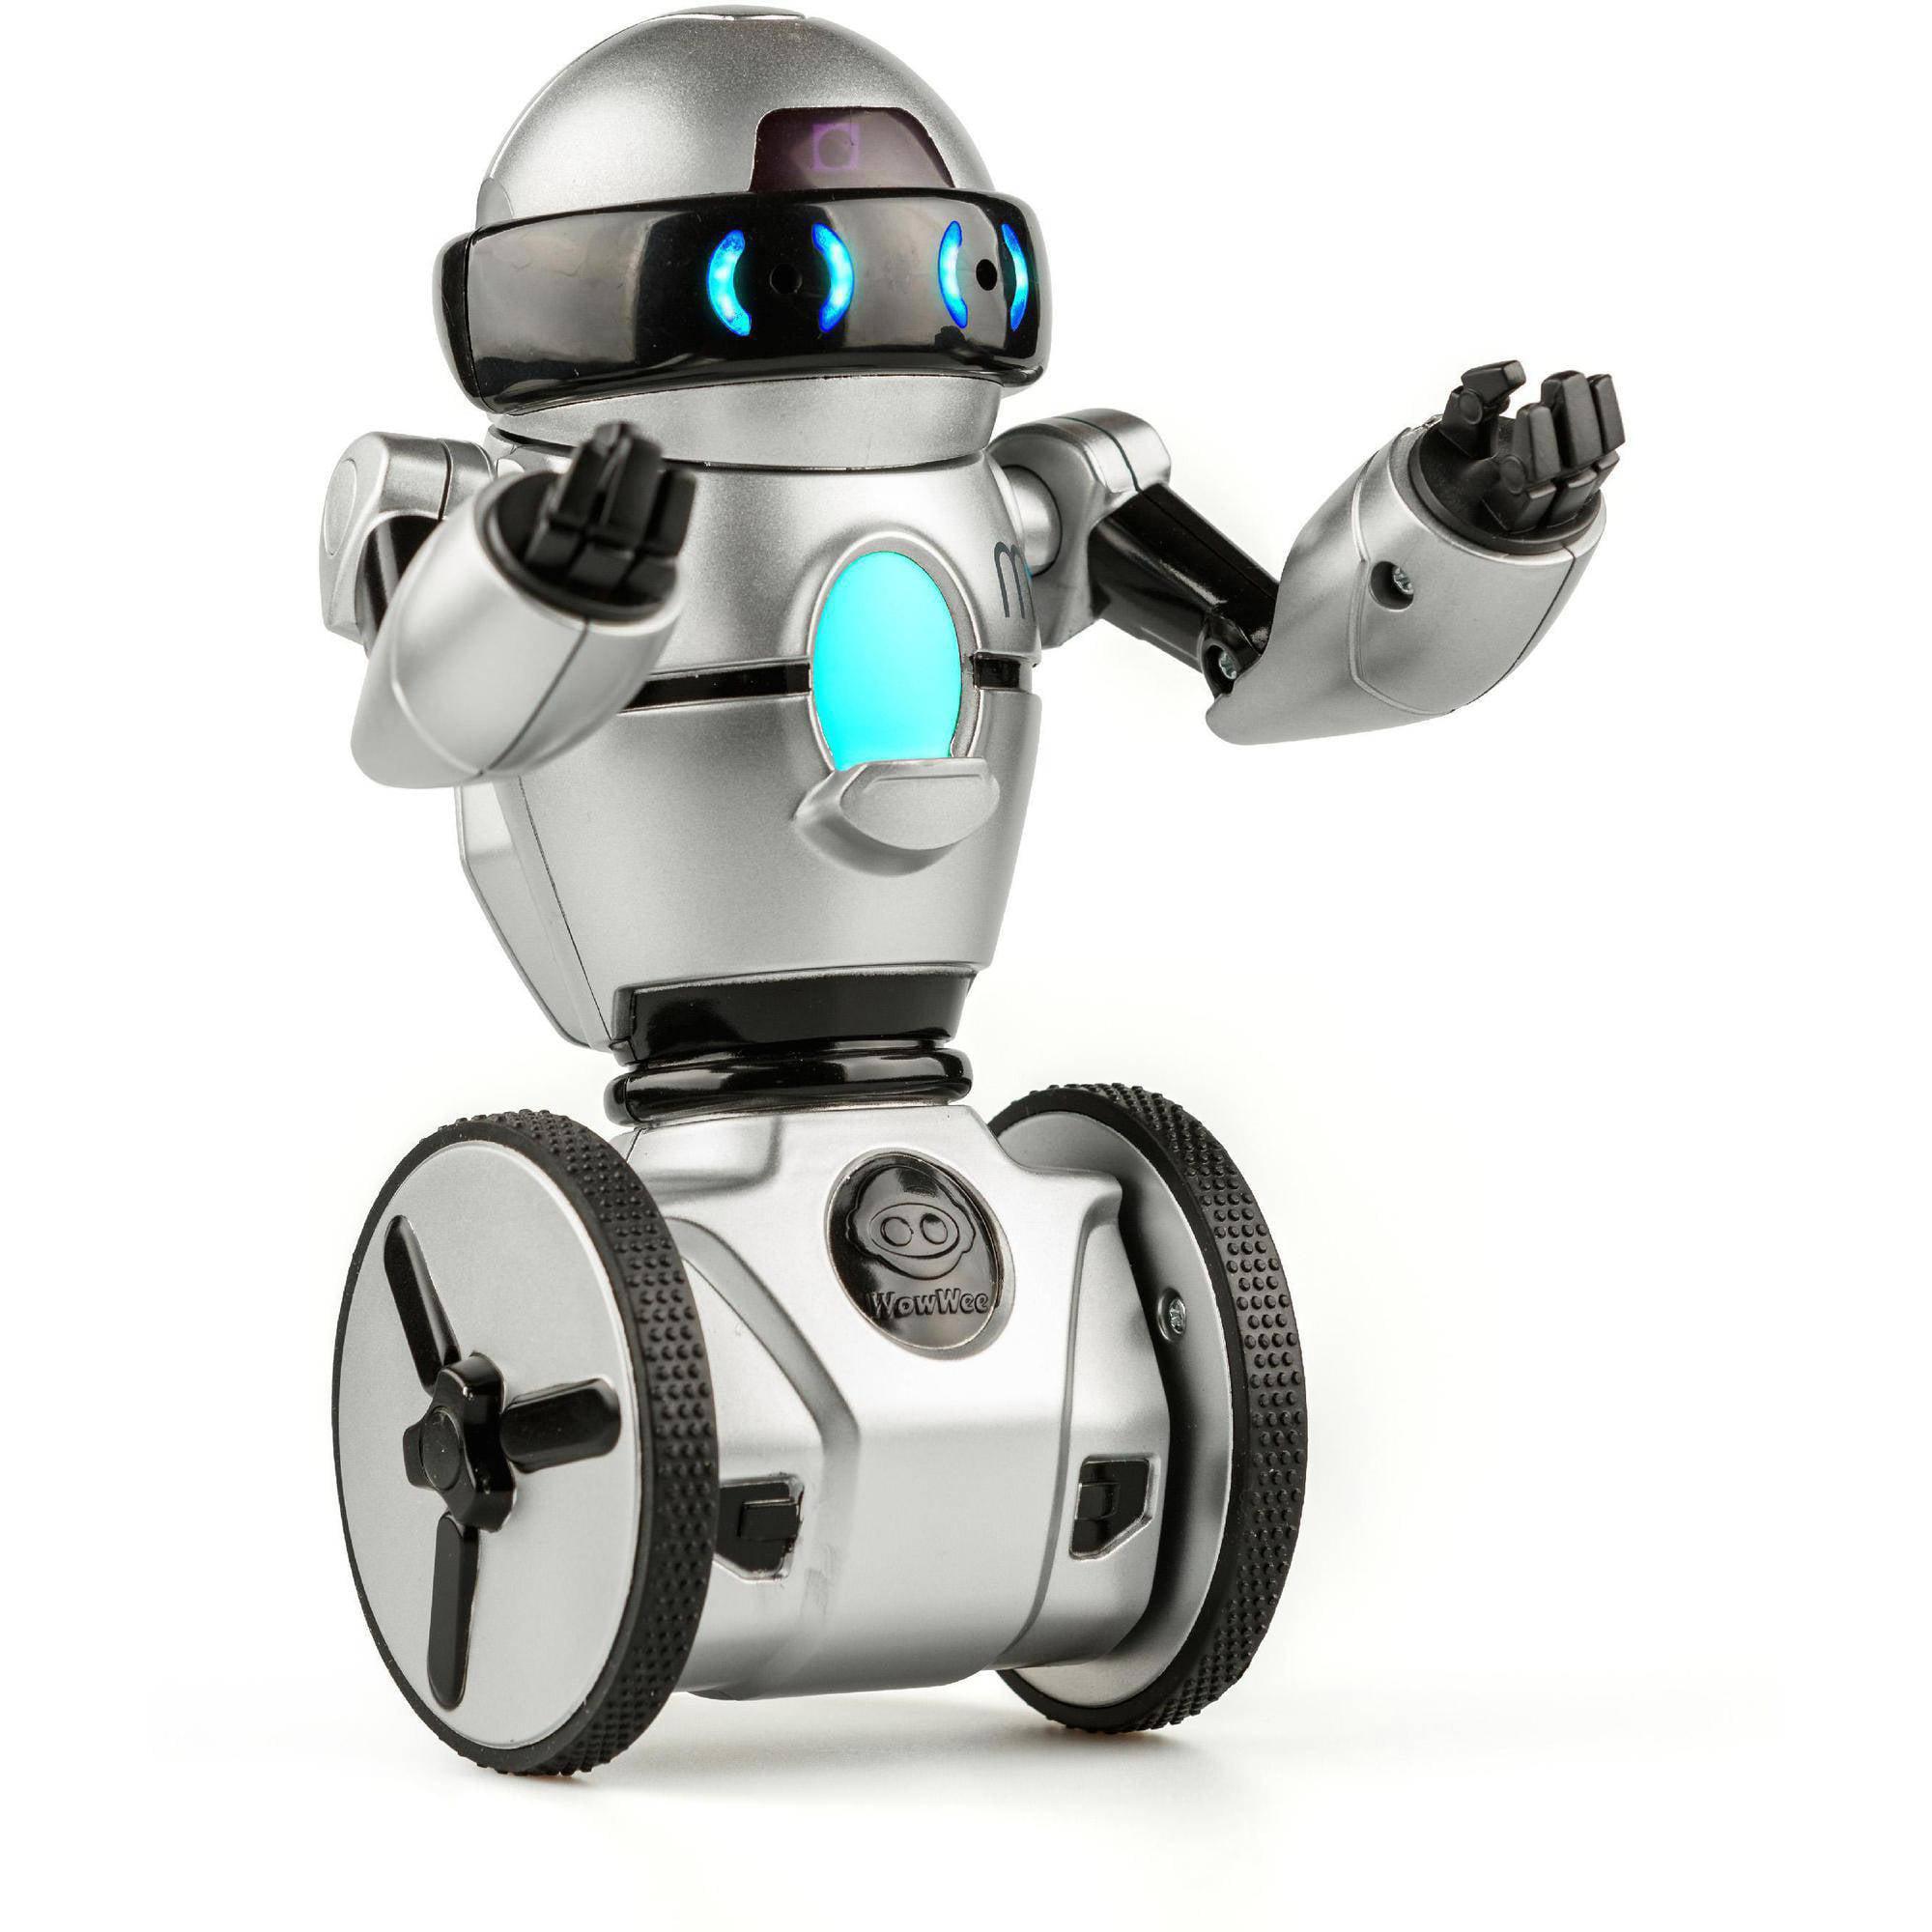 Wowwee 0825 Mip Robot black Walmart